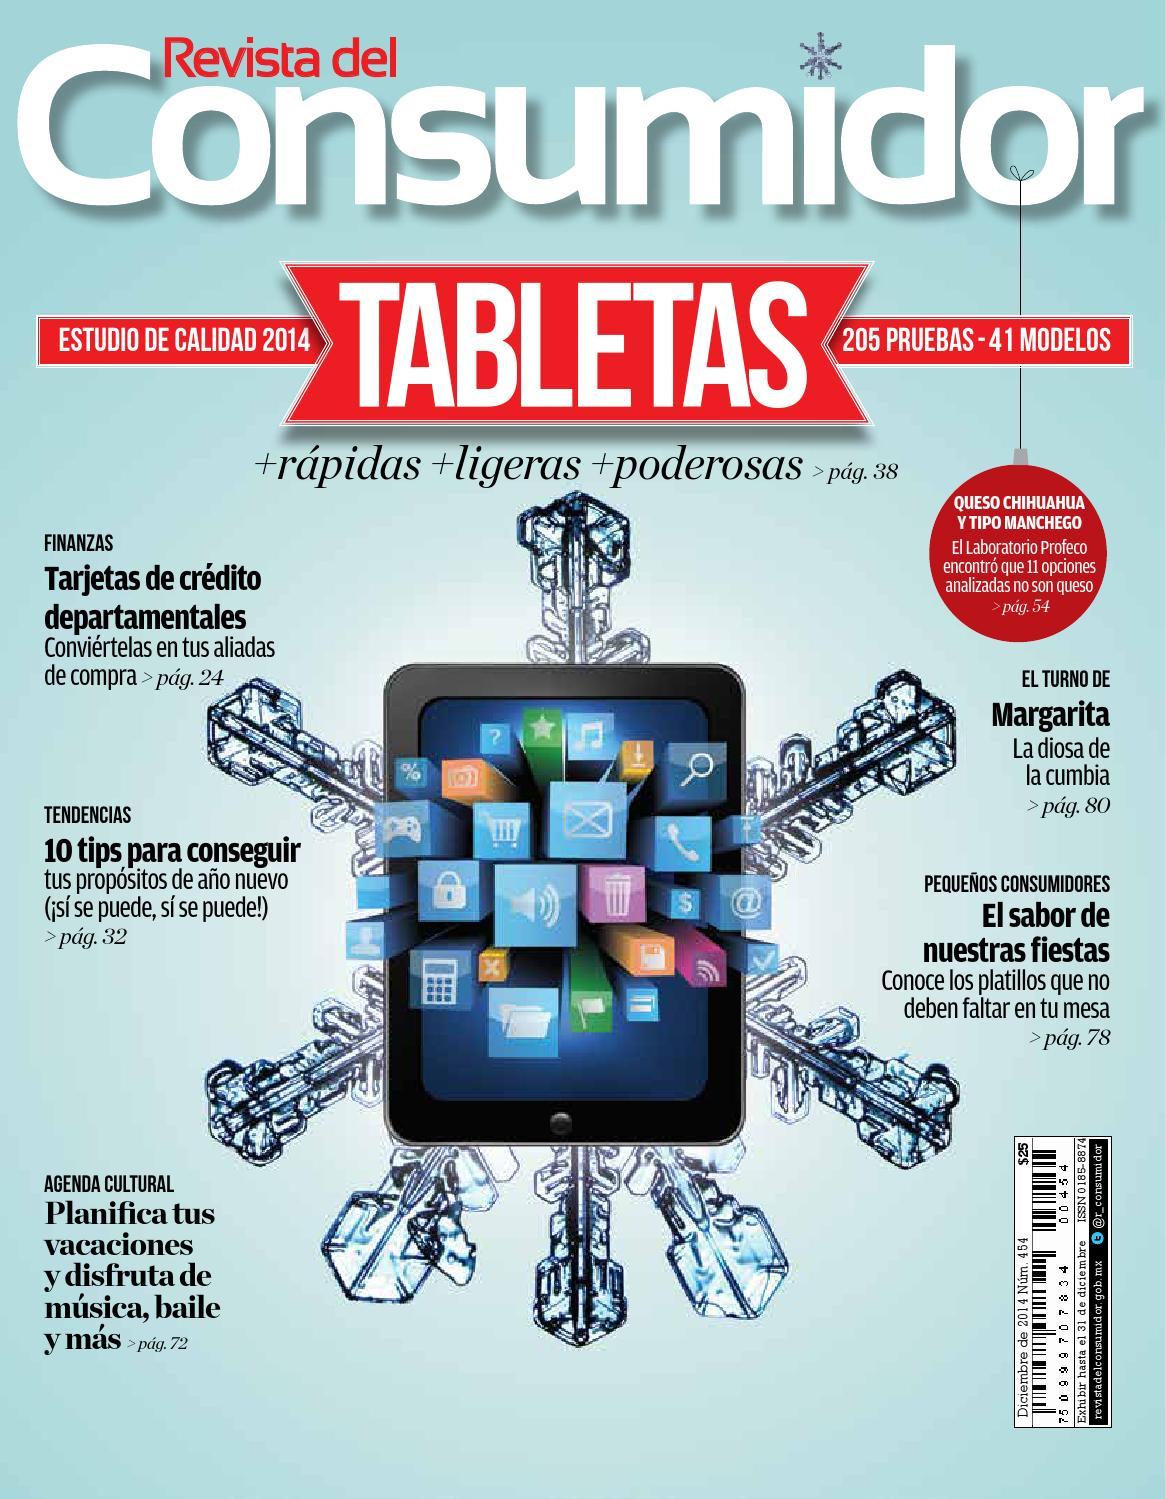 Revista del Consumidor 2014 diciembre Ed. 454 by PROFECO - issuu 2bbbf3d45997